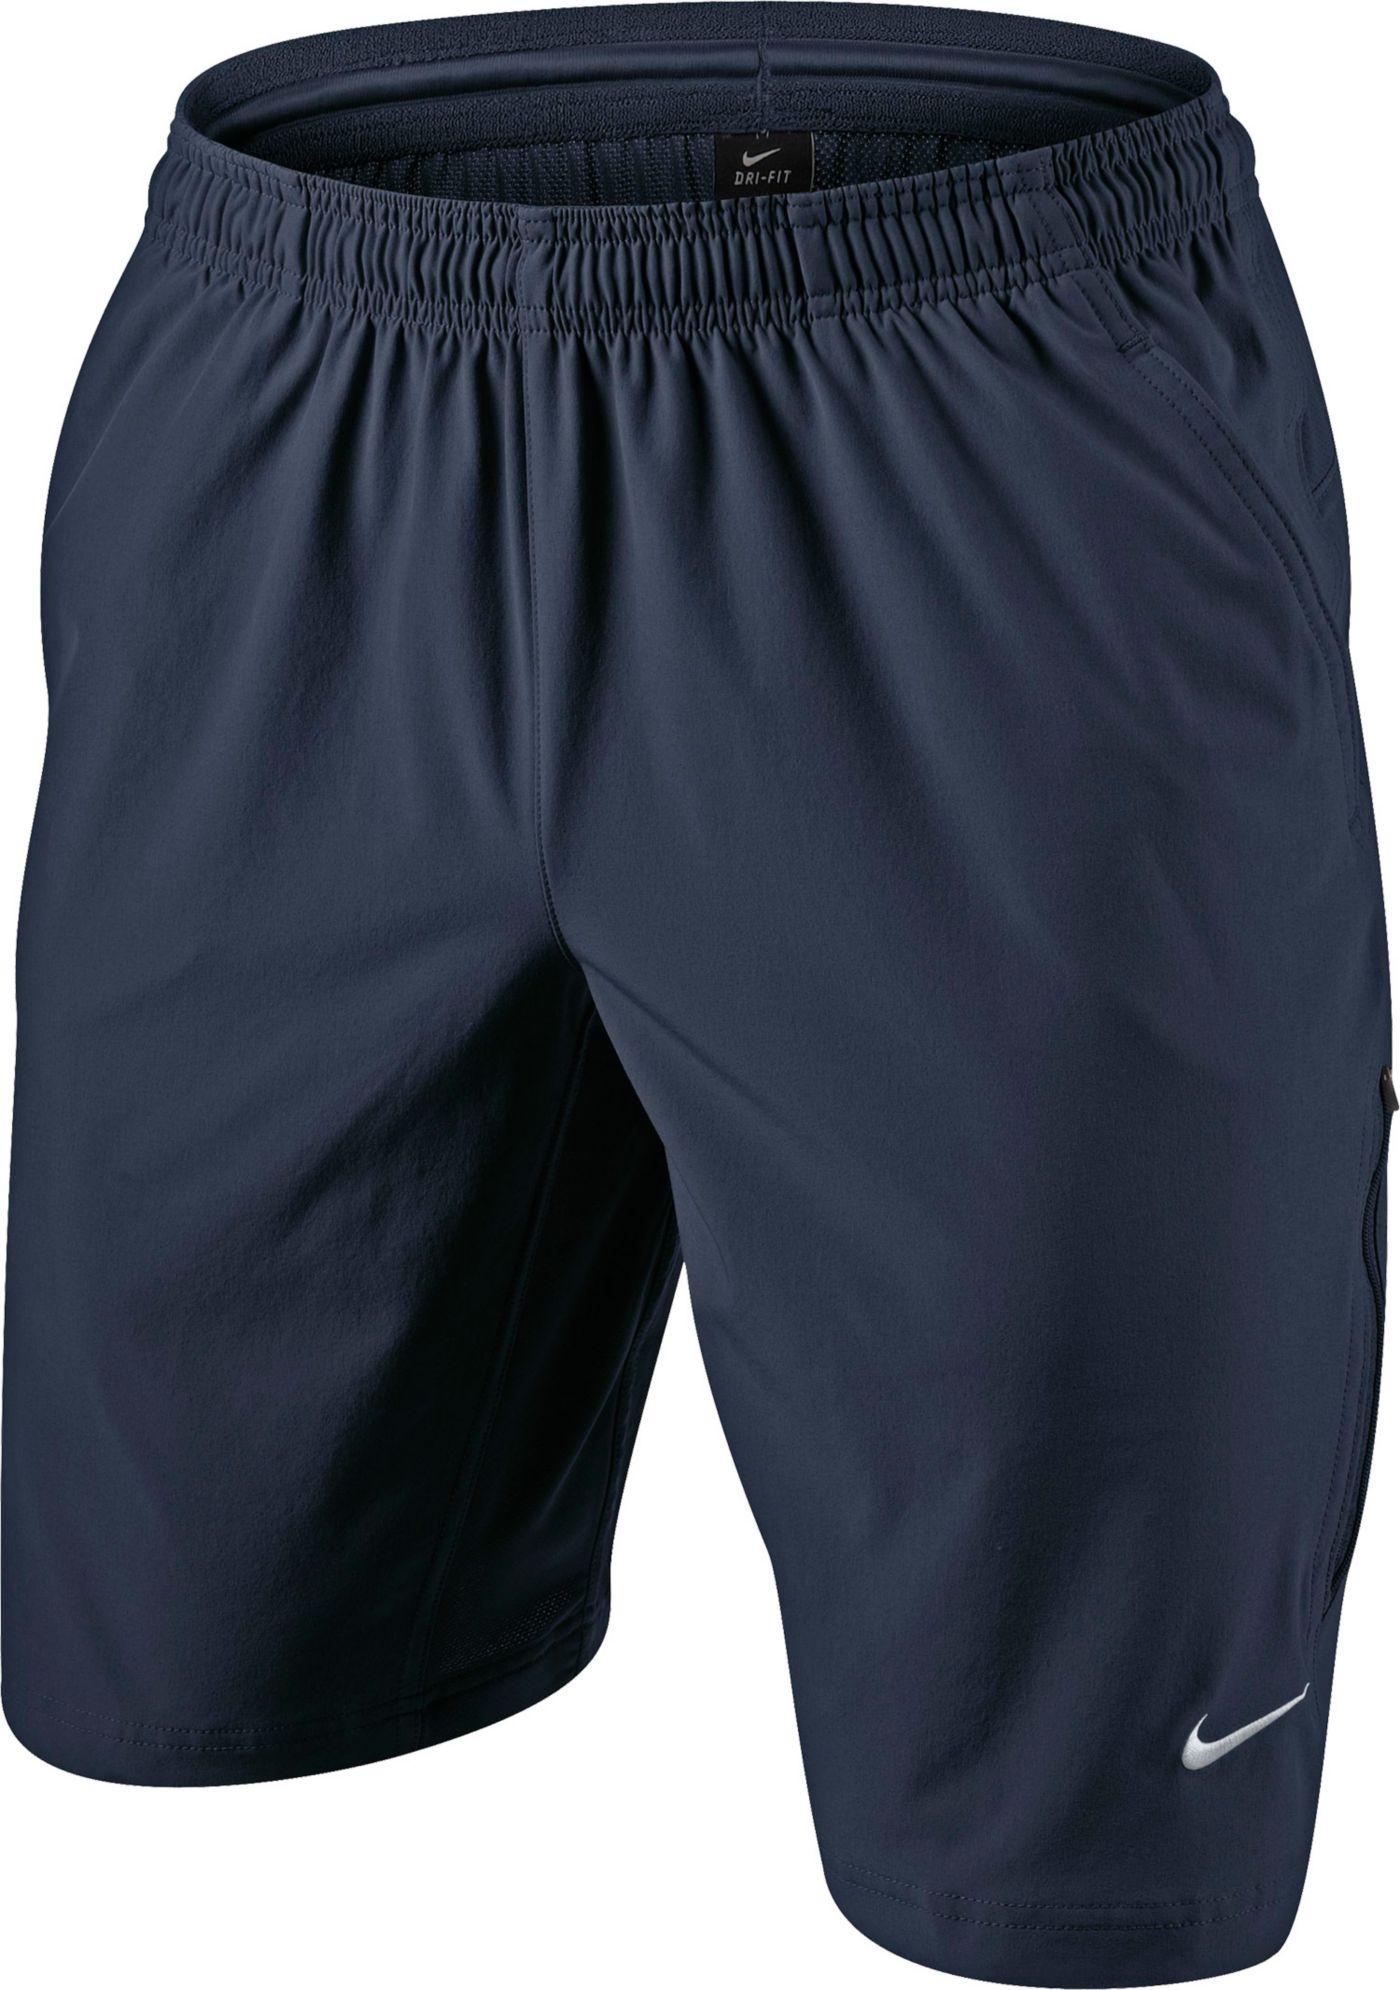 Nike Men's N.E.T 11'' Woven Tennis Shorts